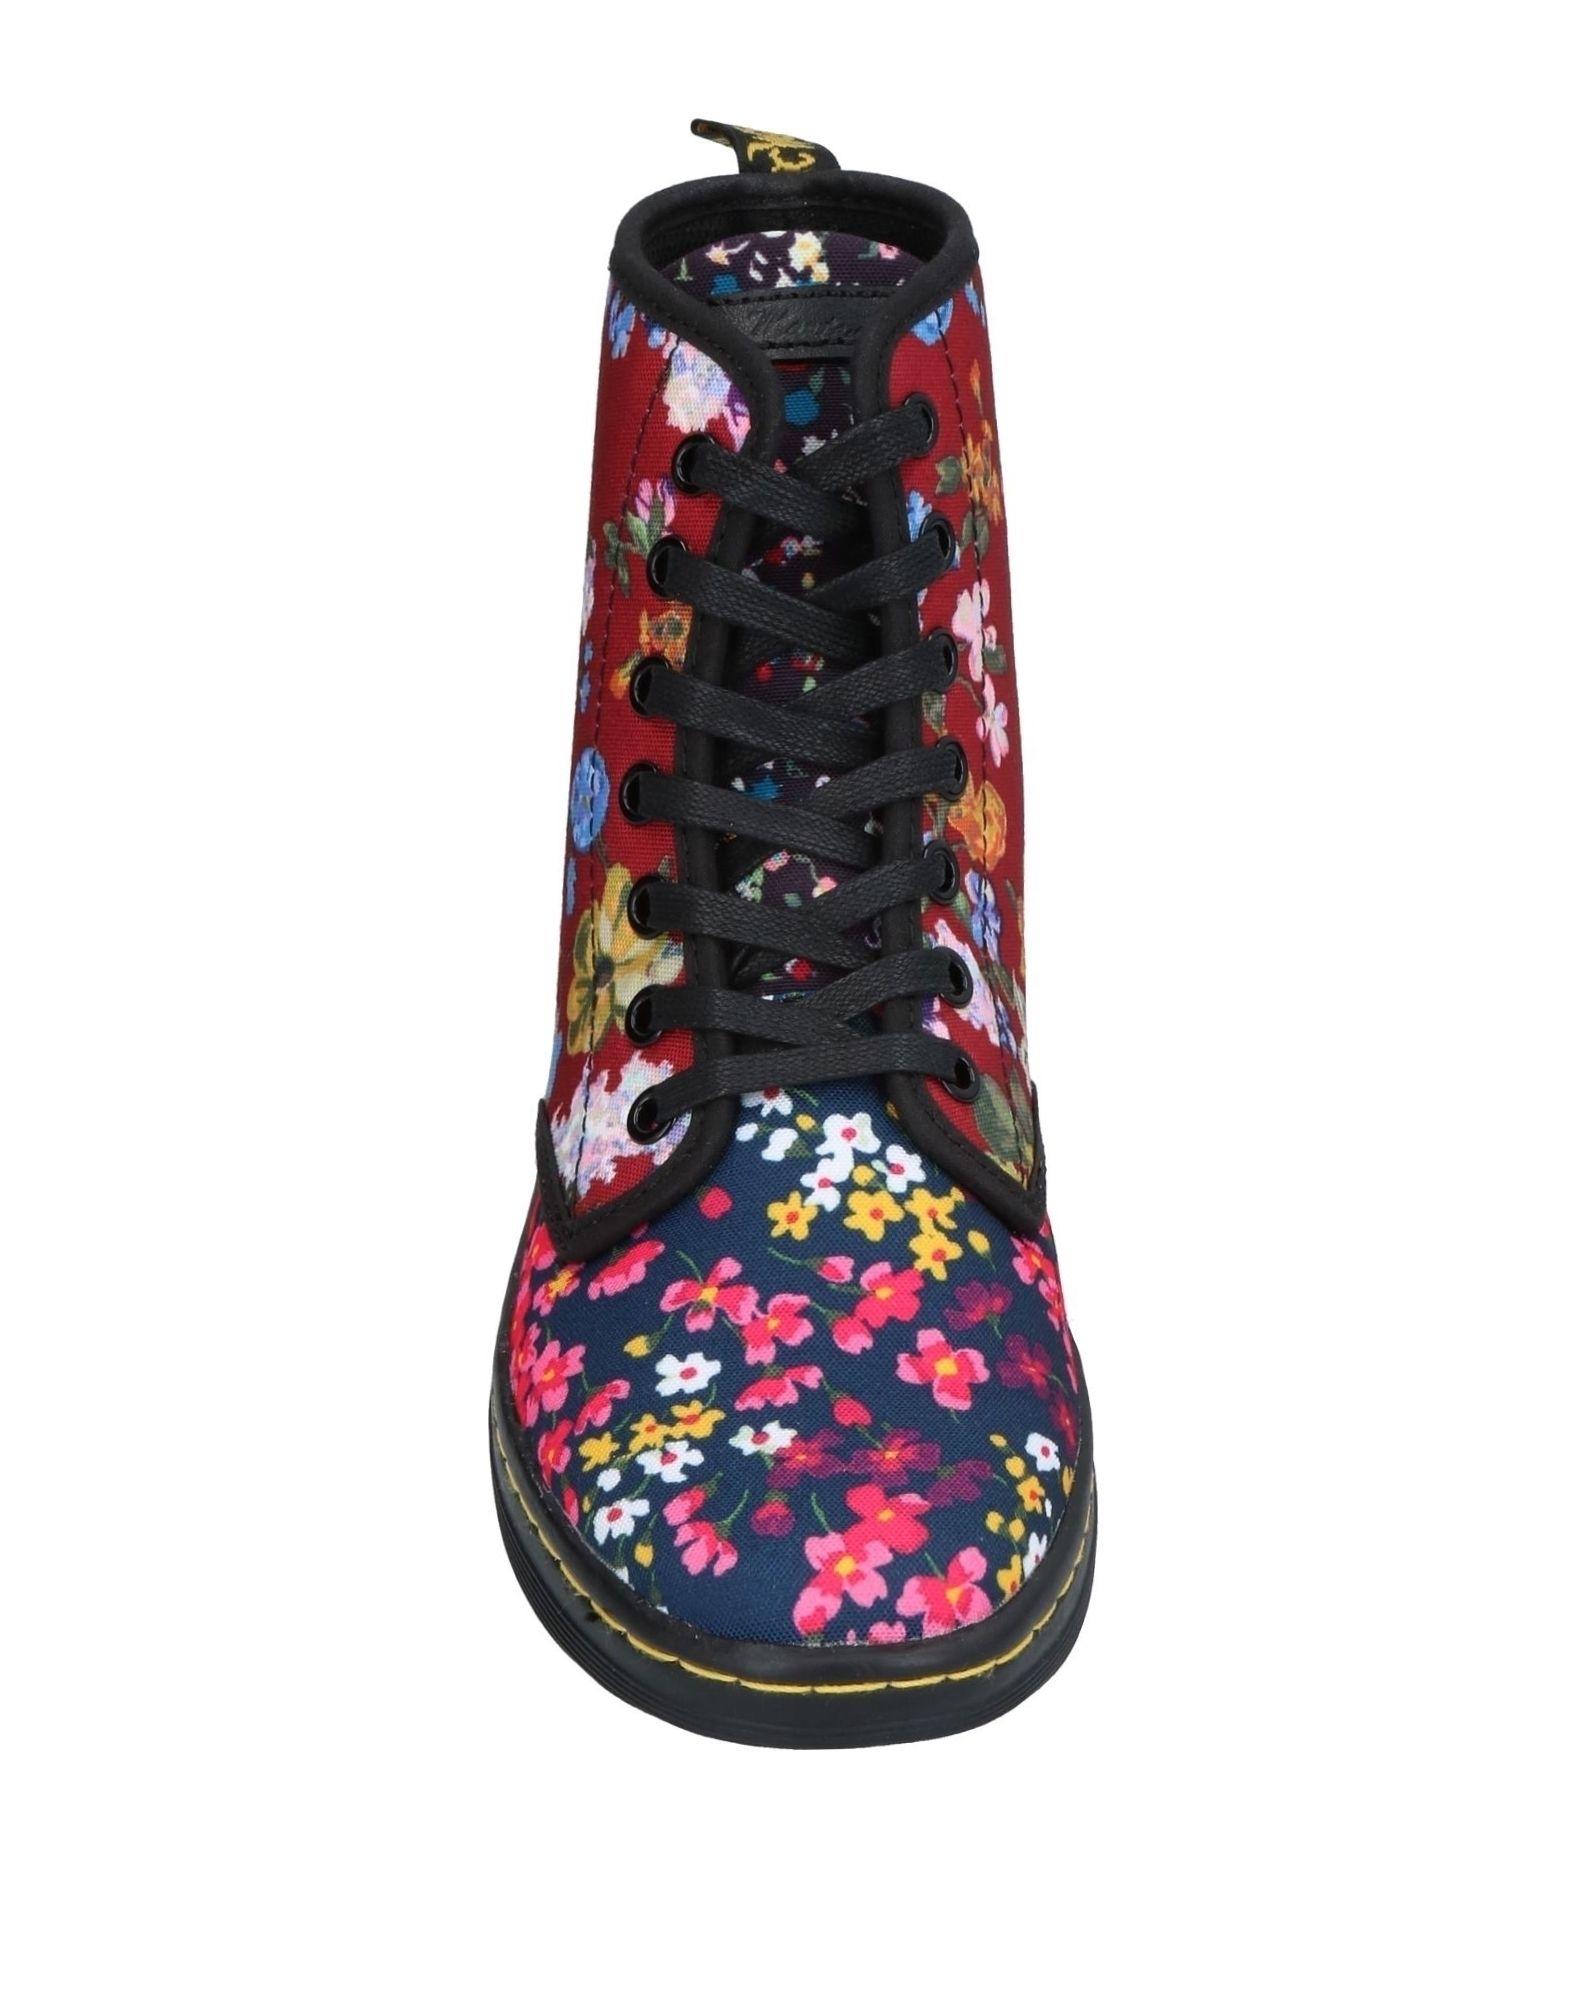 Dr. Martens Martens Martens Sneakers - Women Dr. Martens Sneakers online on  Canada - 11404433AF c78a14